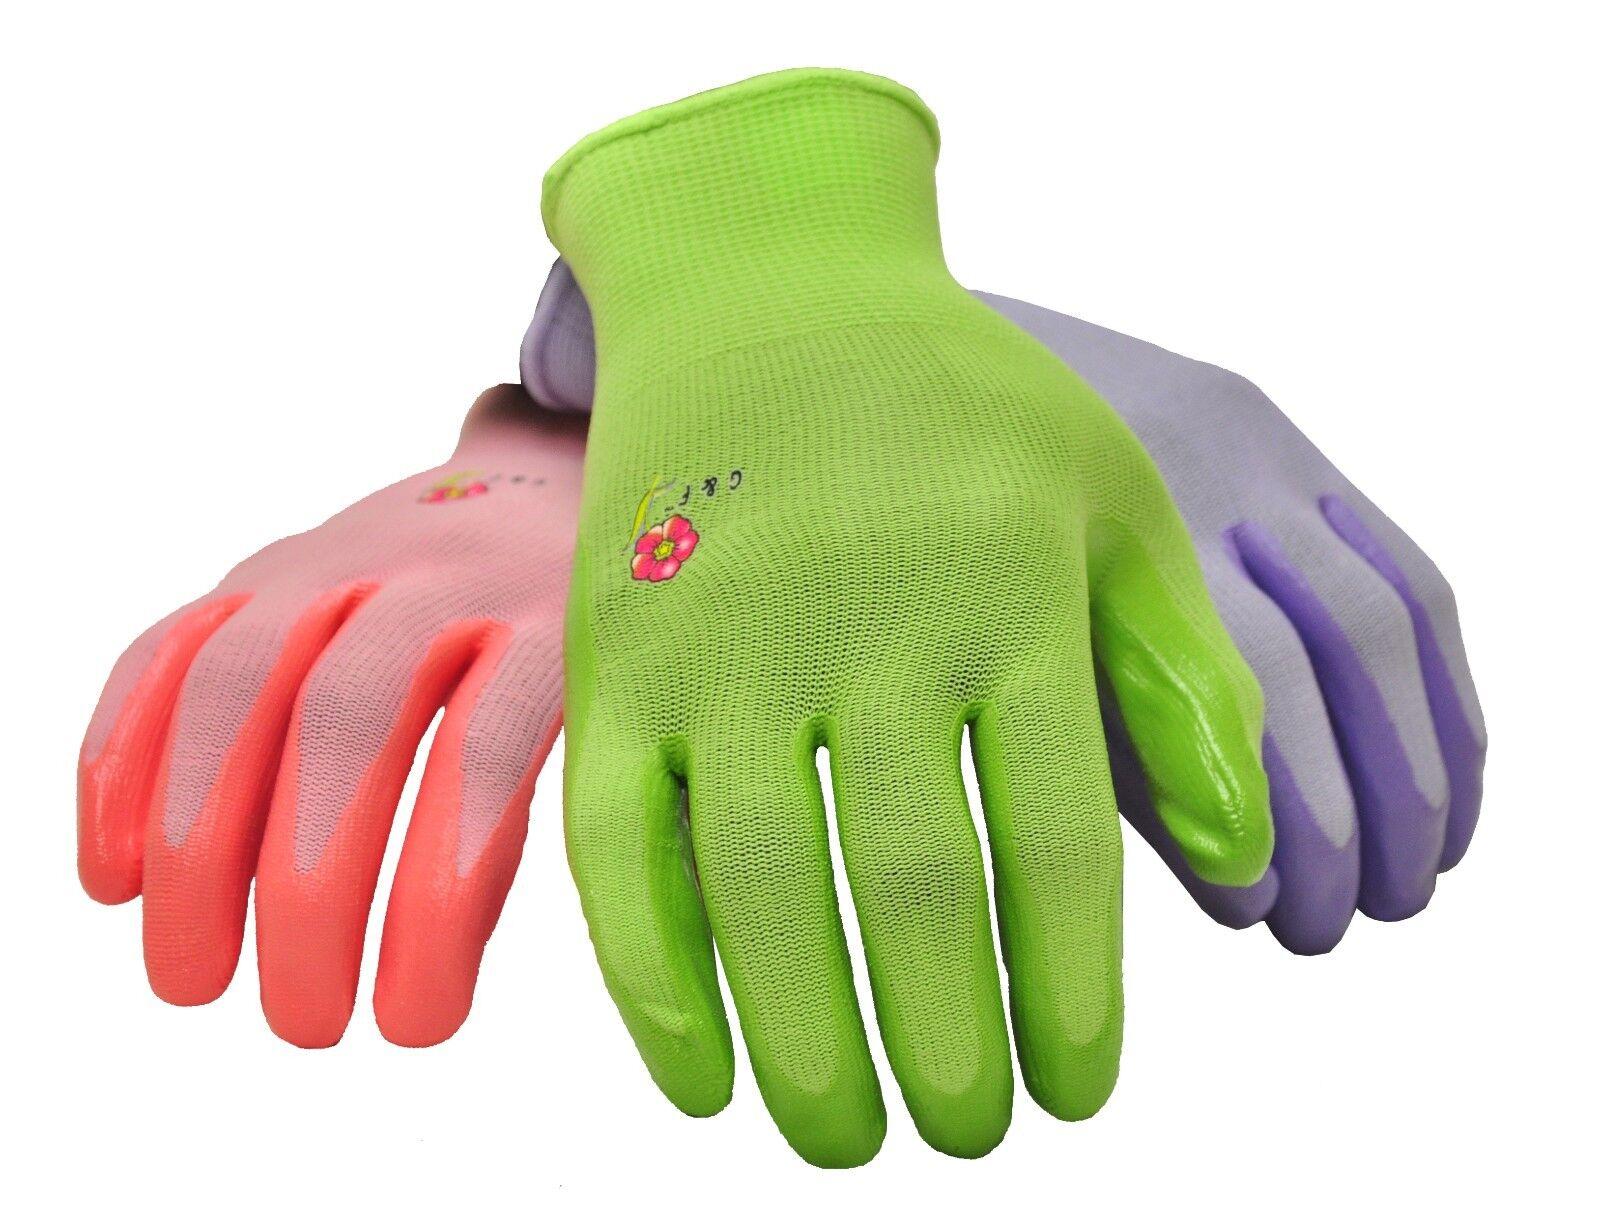 G & F 15226 Women's Garden Gloves, 6 Pair Pack, assorted colors 11